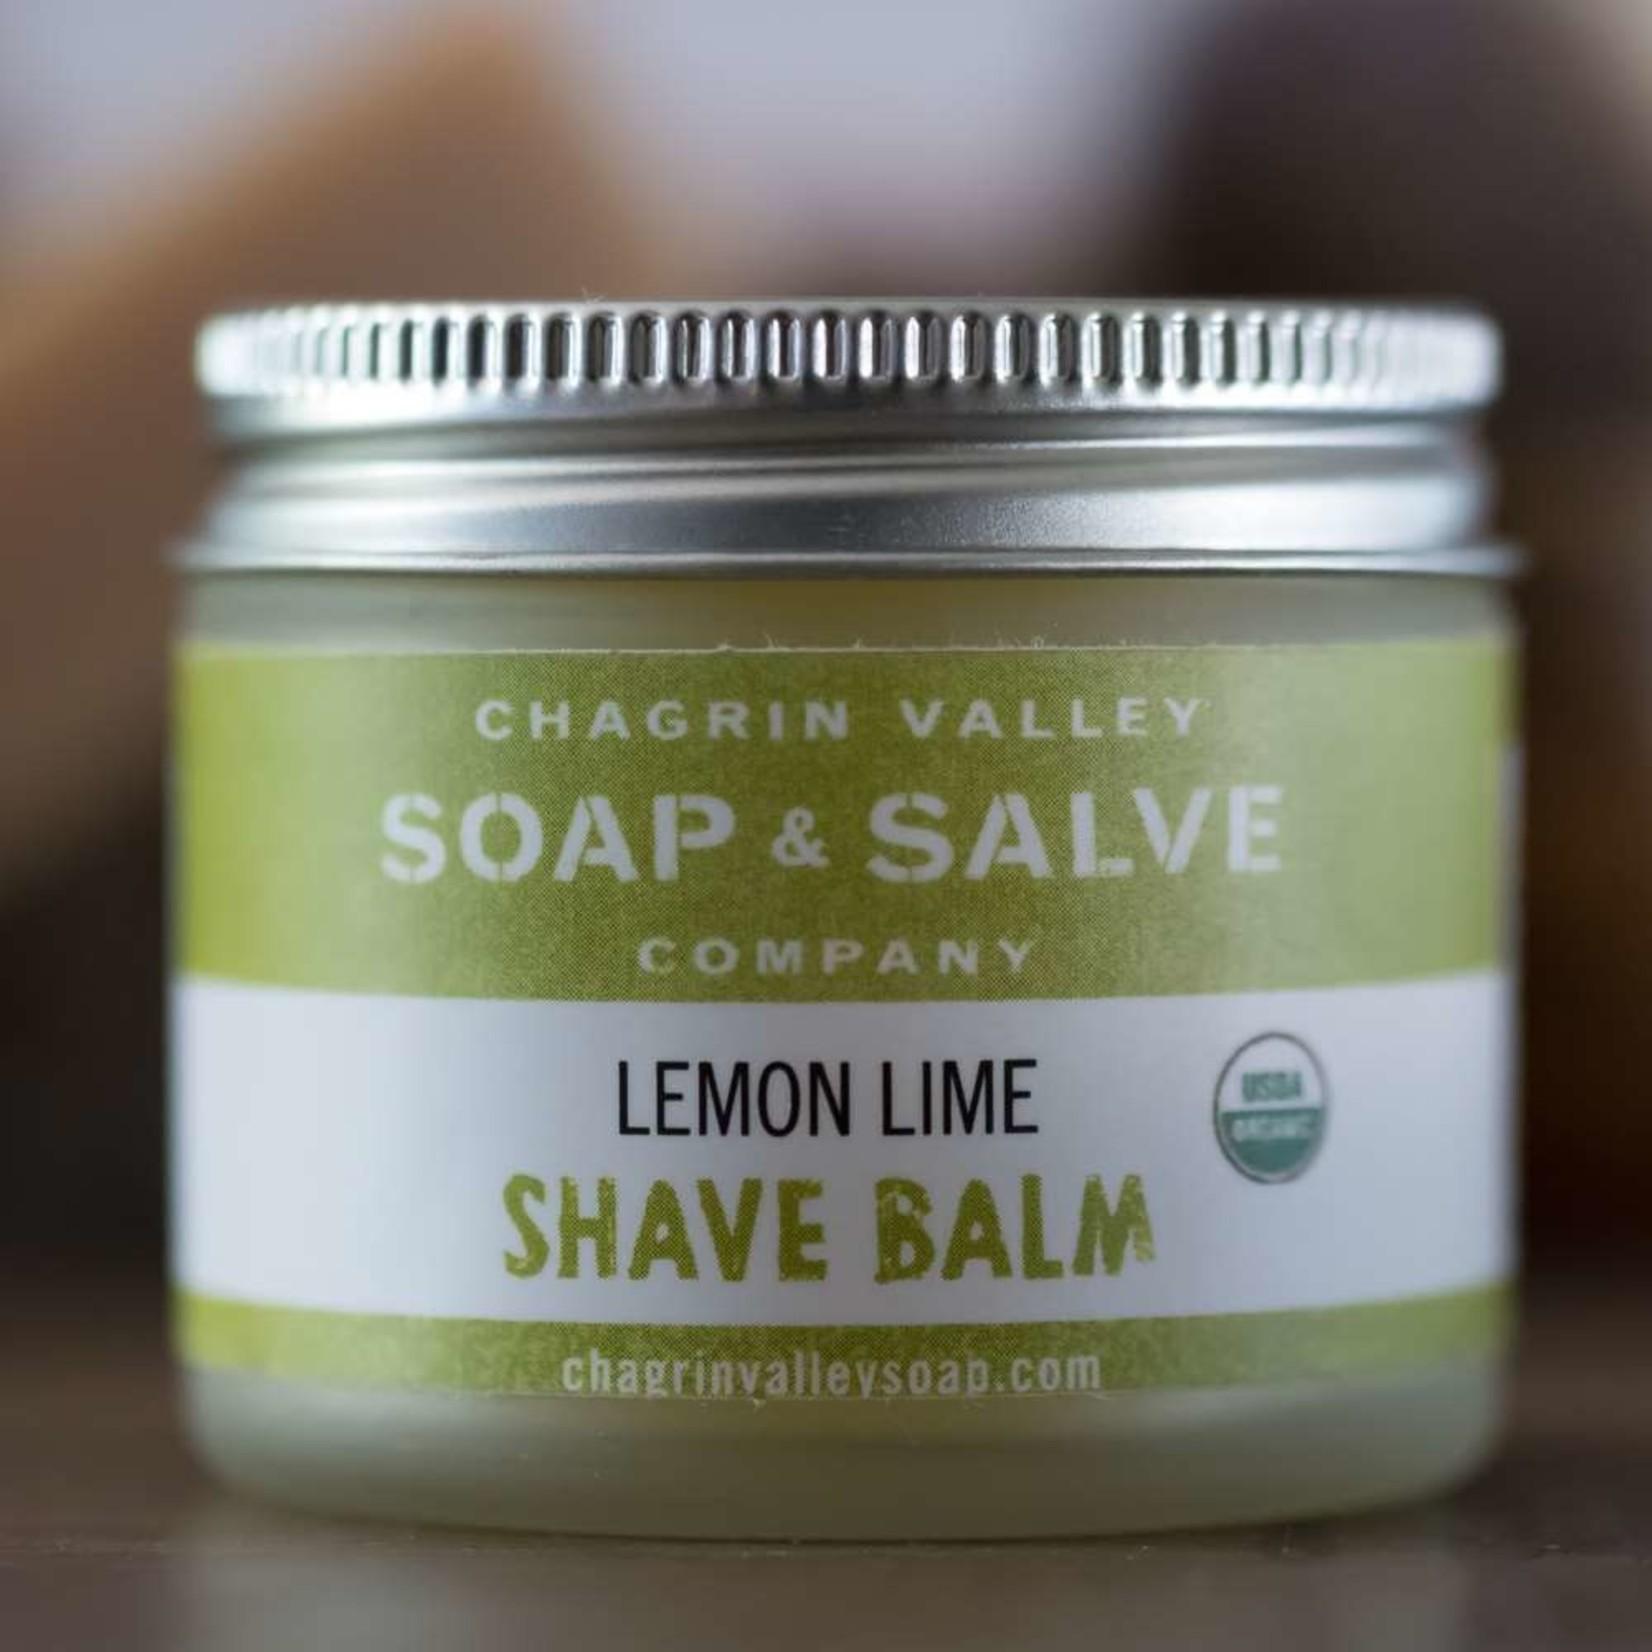 Chagrin Valley Soap and Salve Lemon Lime Shave Balm 2.2oz Jar